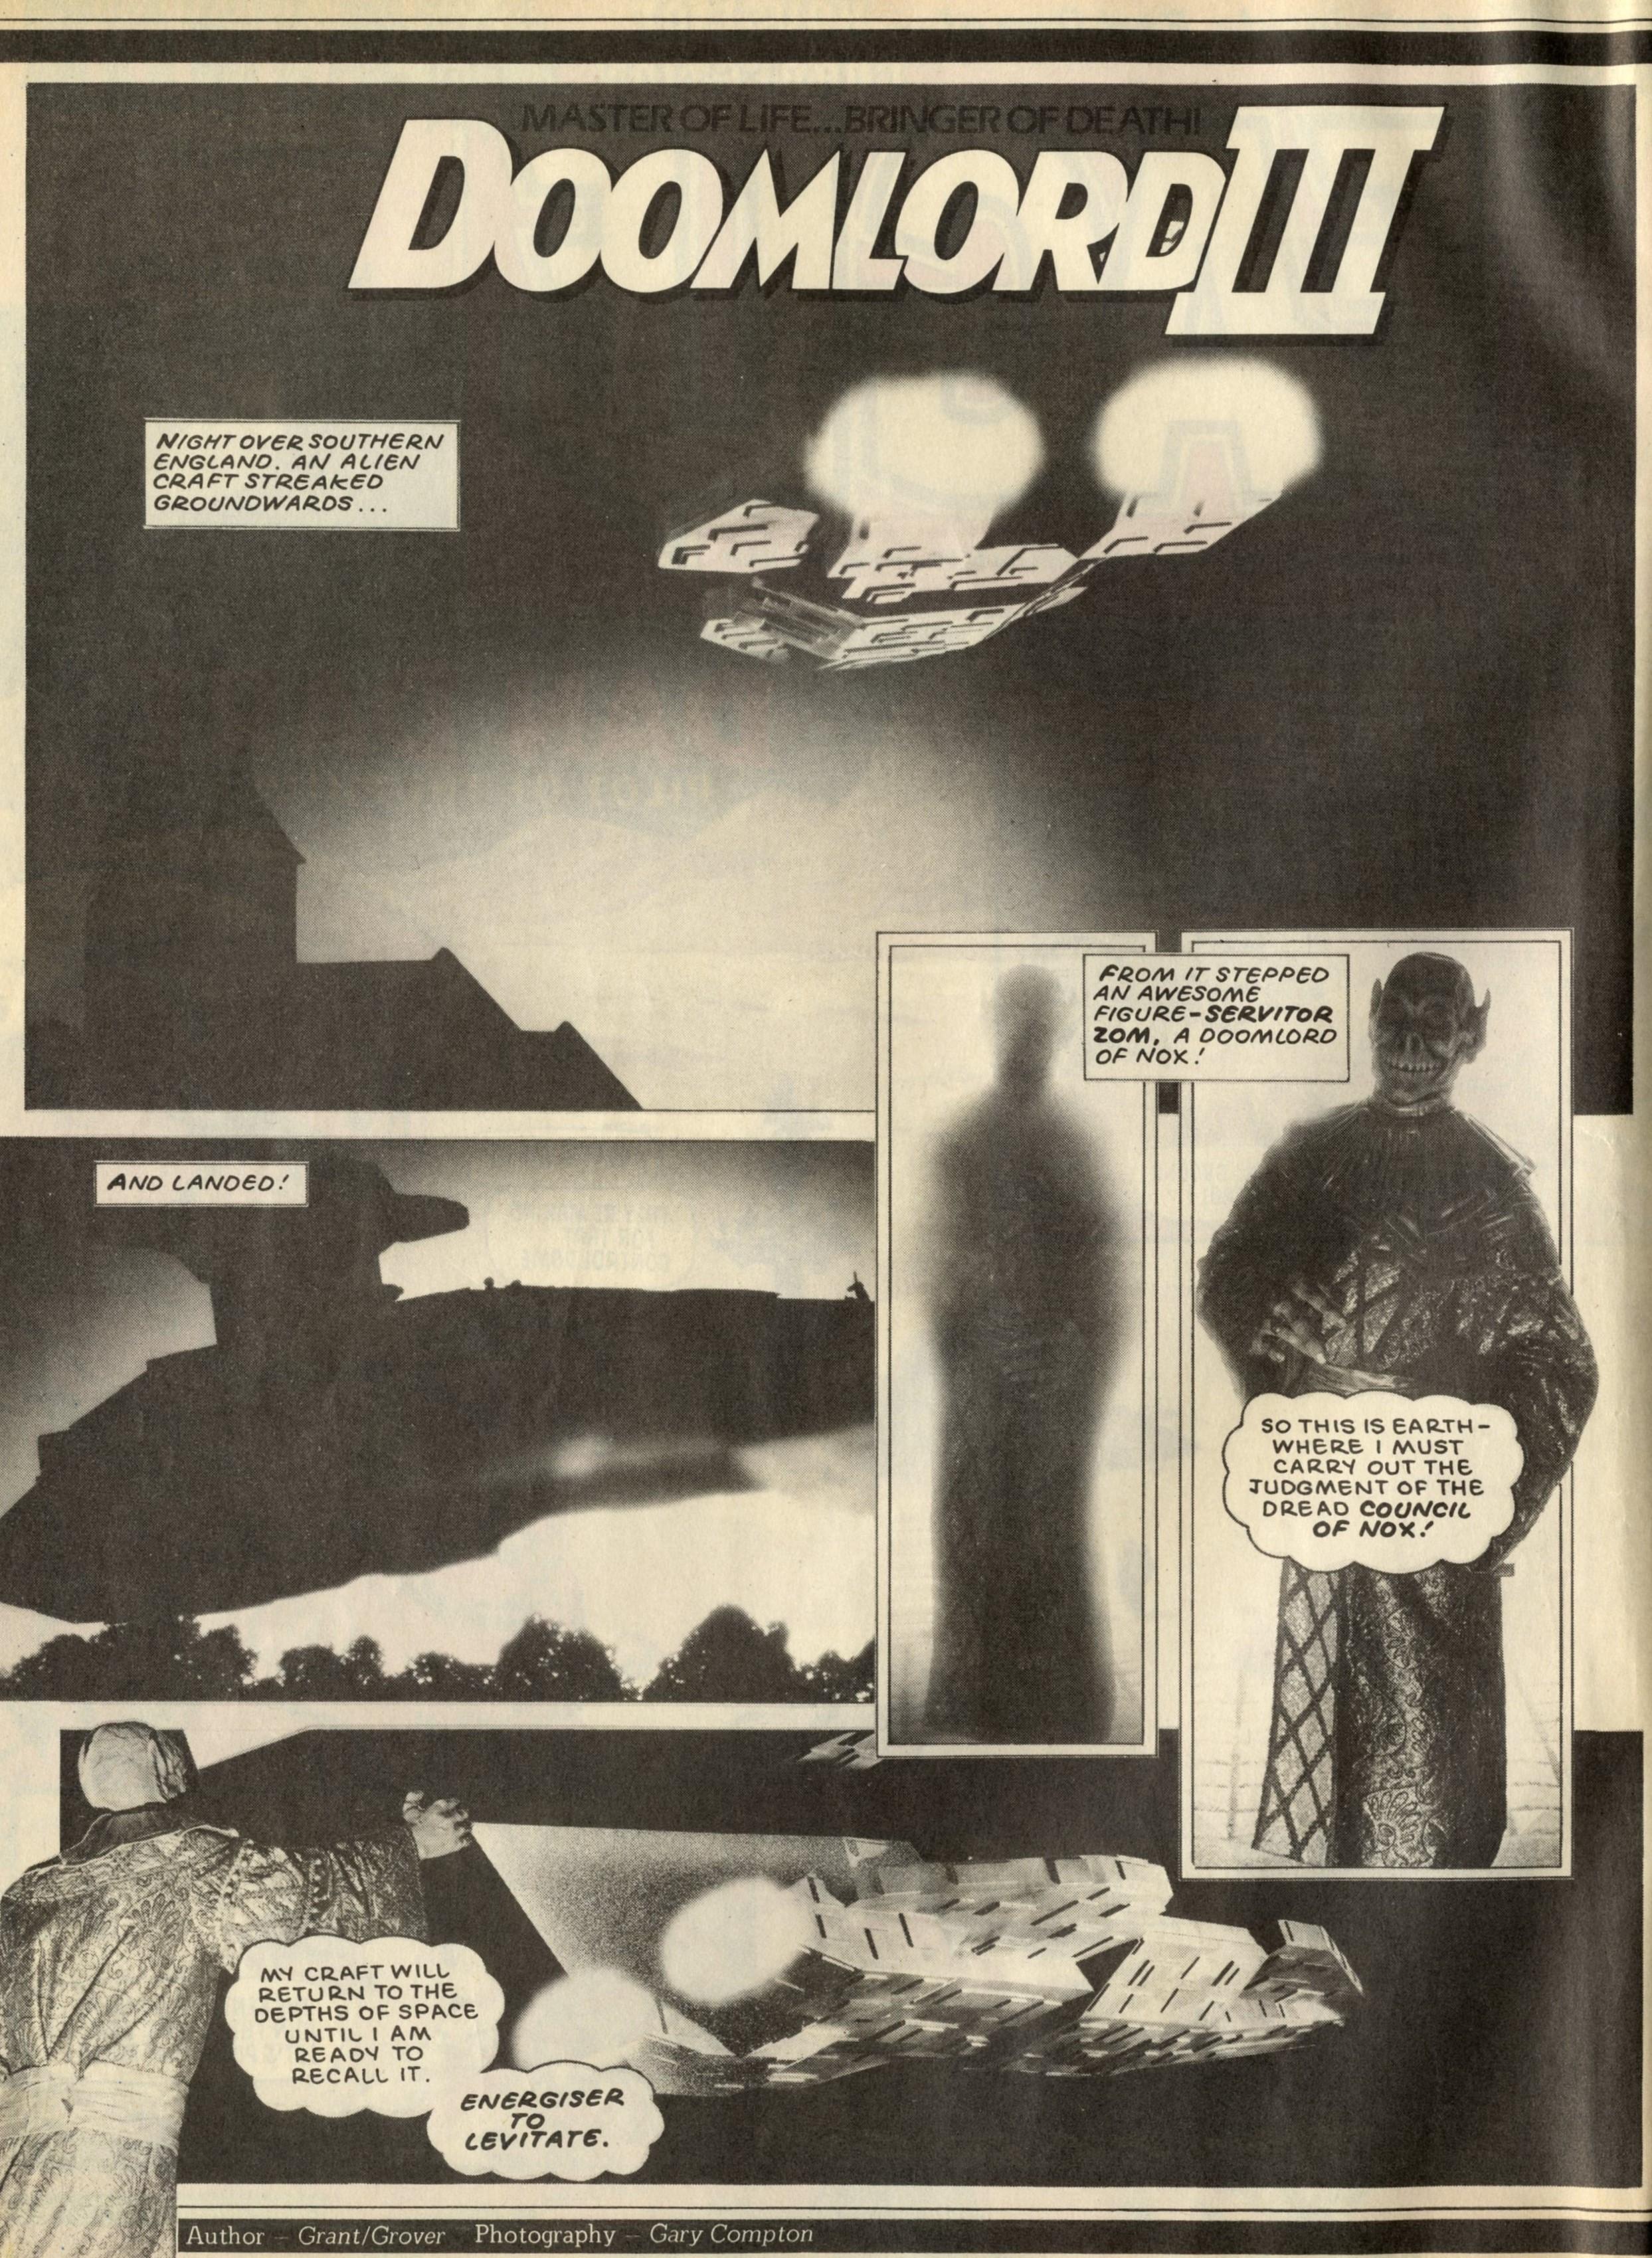 Doomlord: Alan Grant and John Wagner (writers), Gary Compton (photographer)